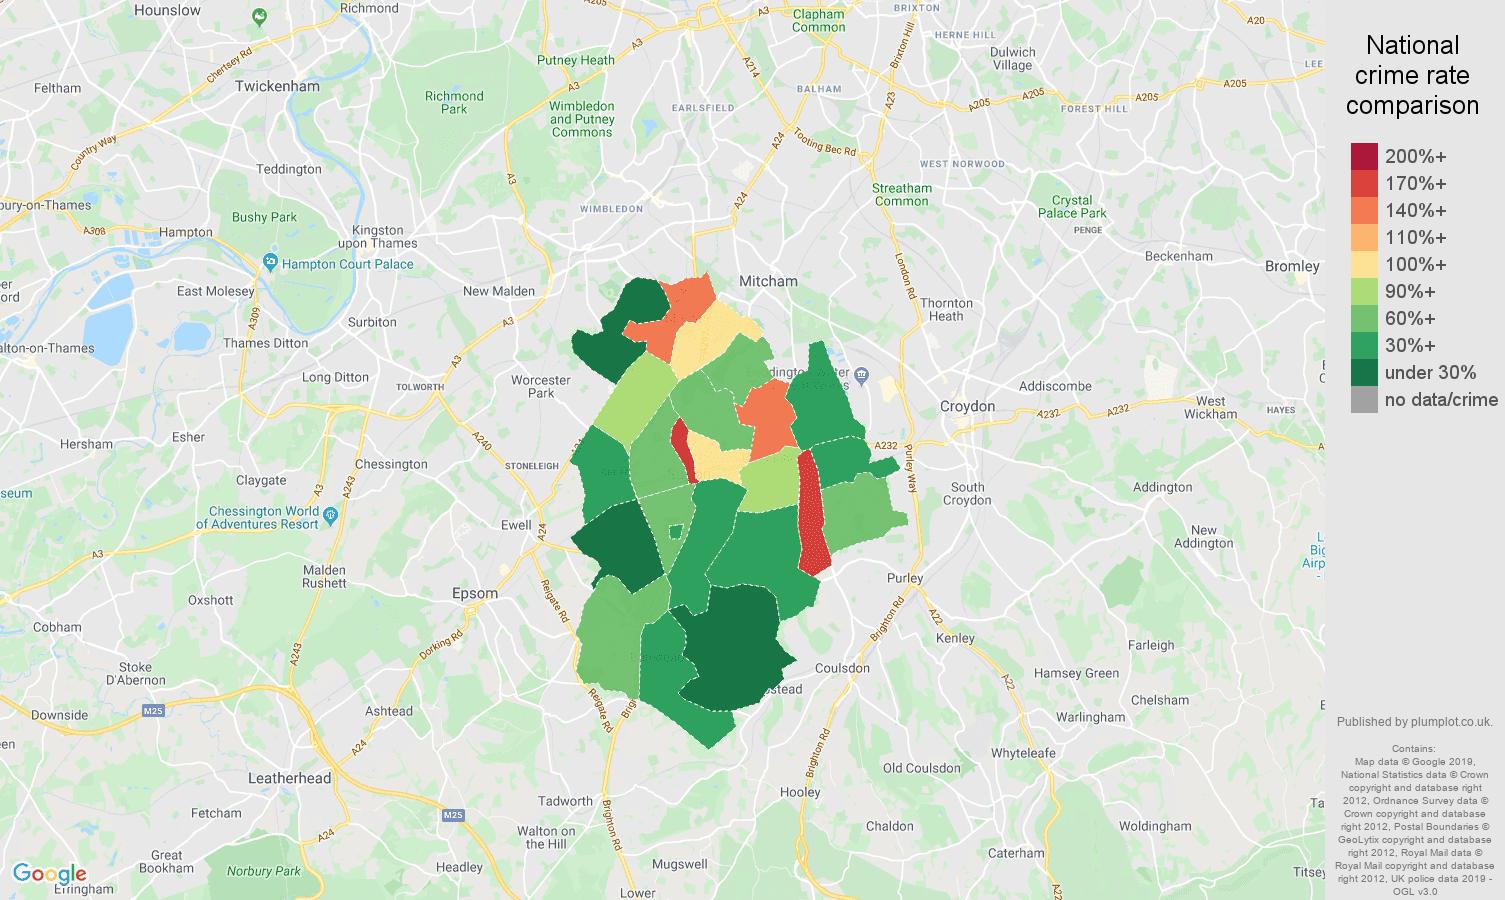 Sutton other theft crime rate comparison map